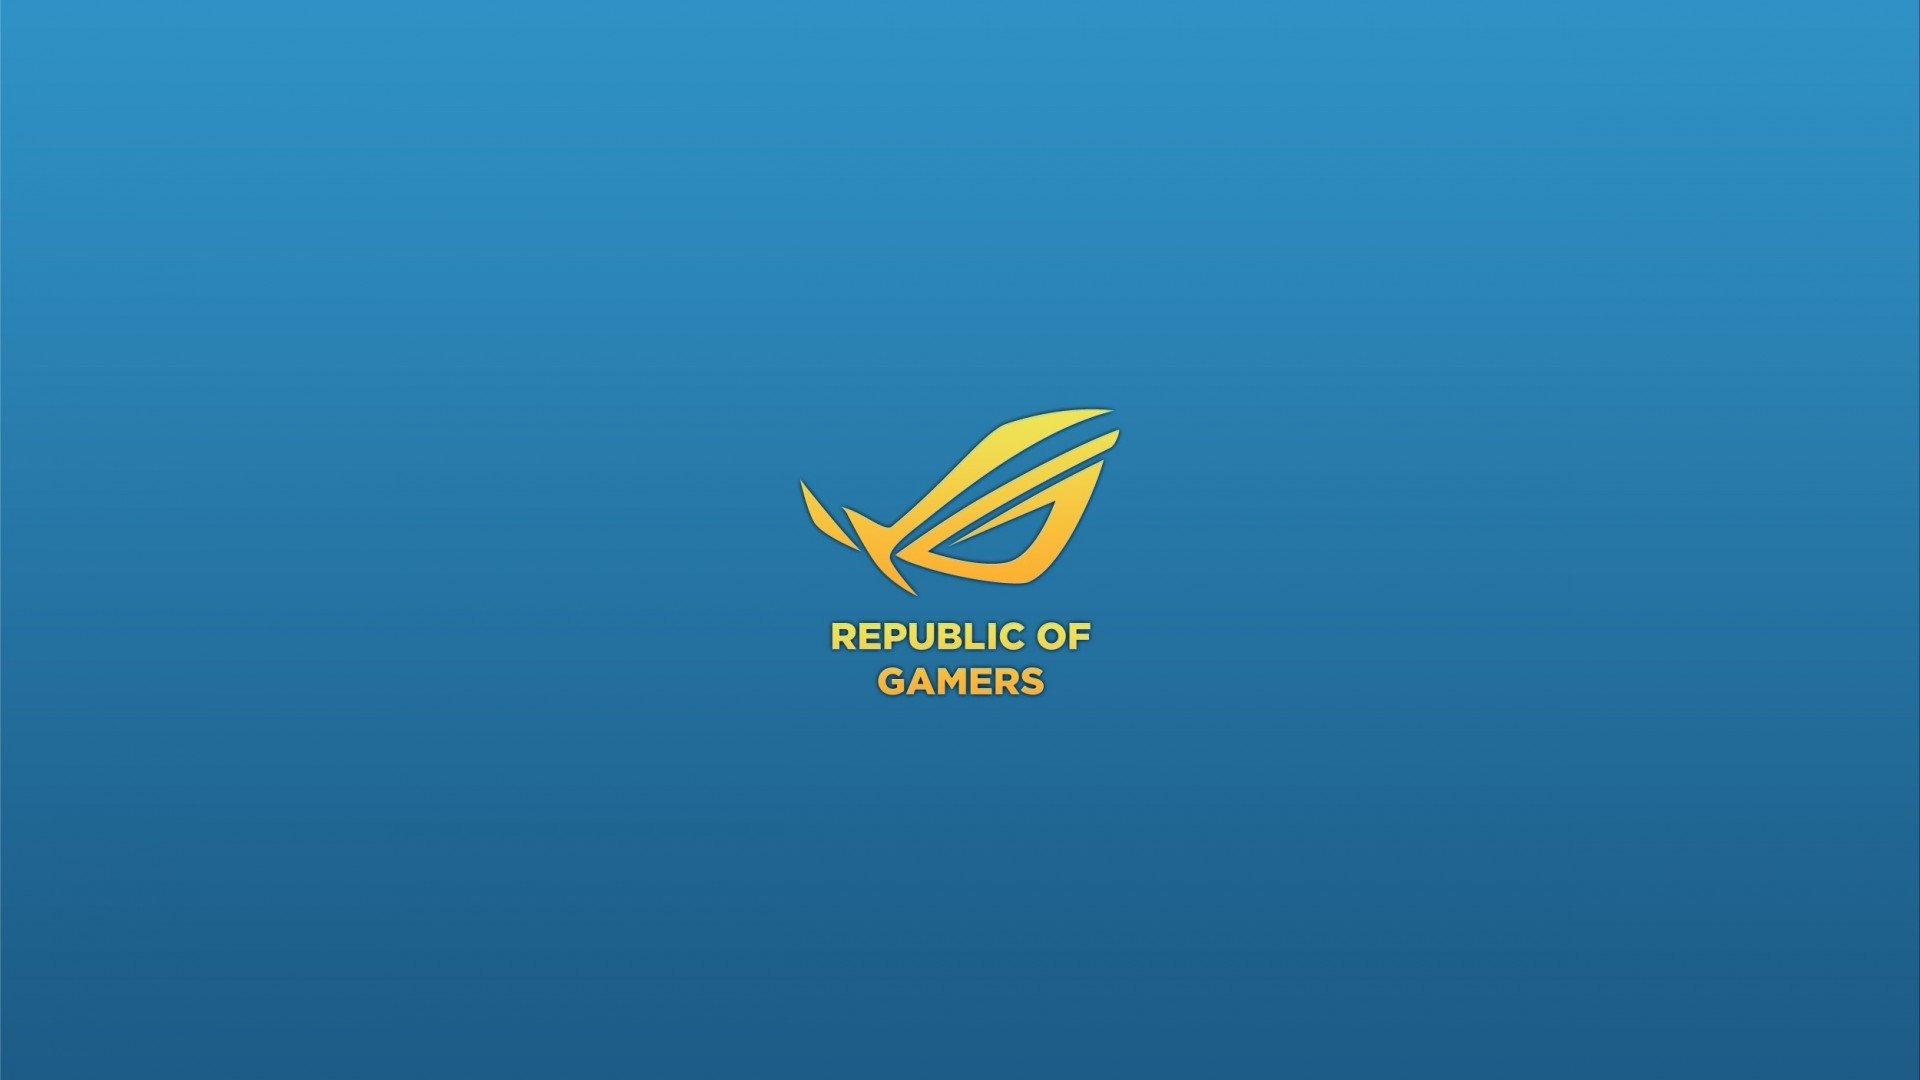 republic of gamers flat - photo #11